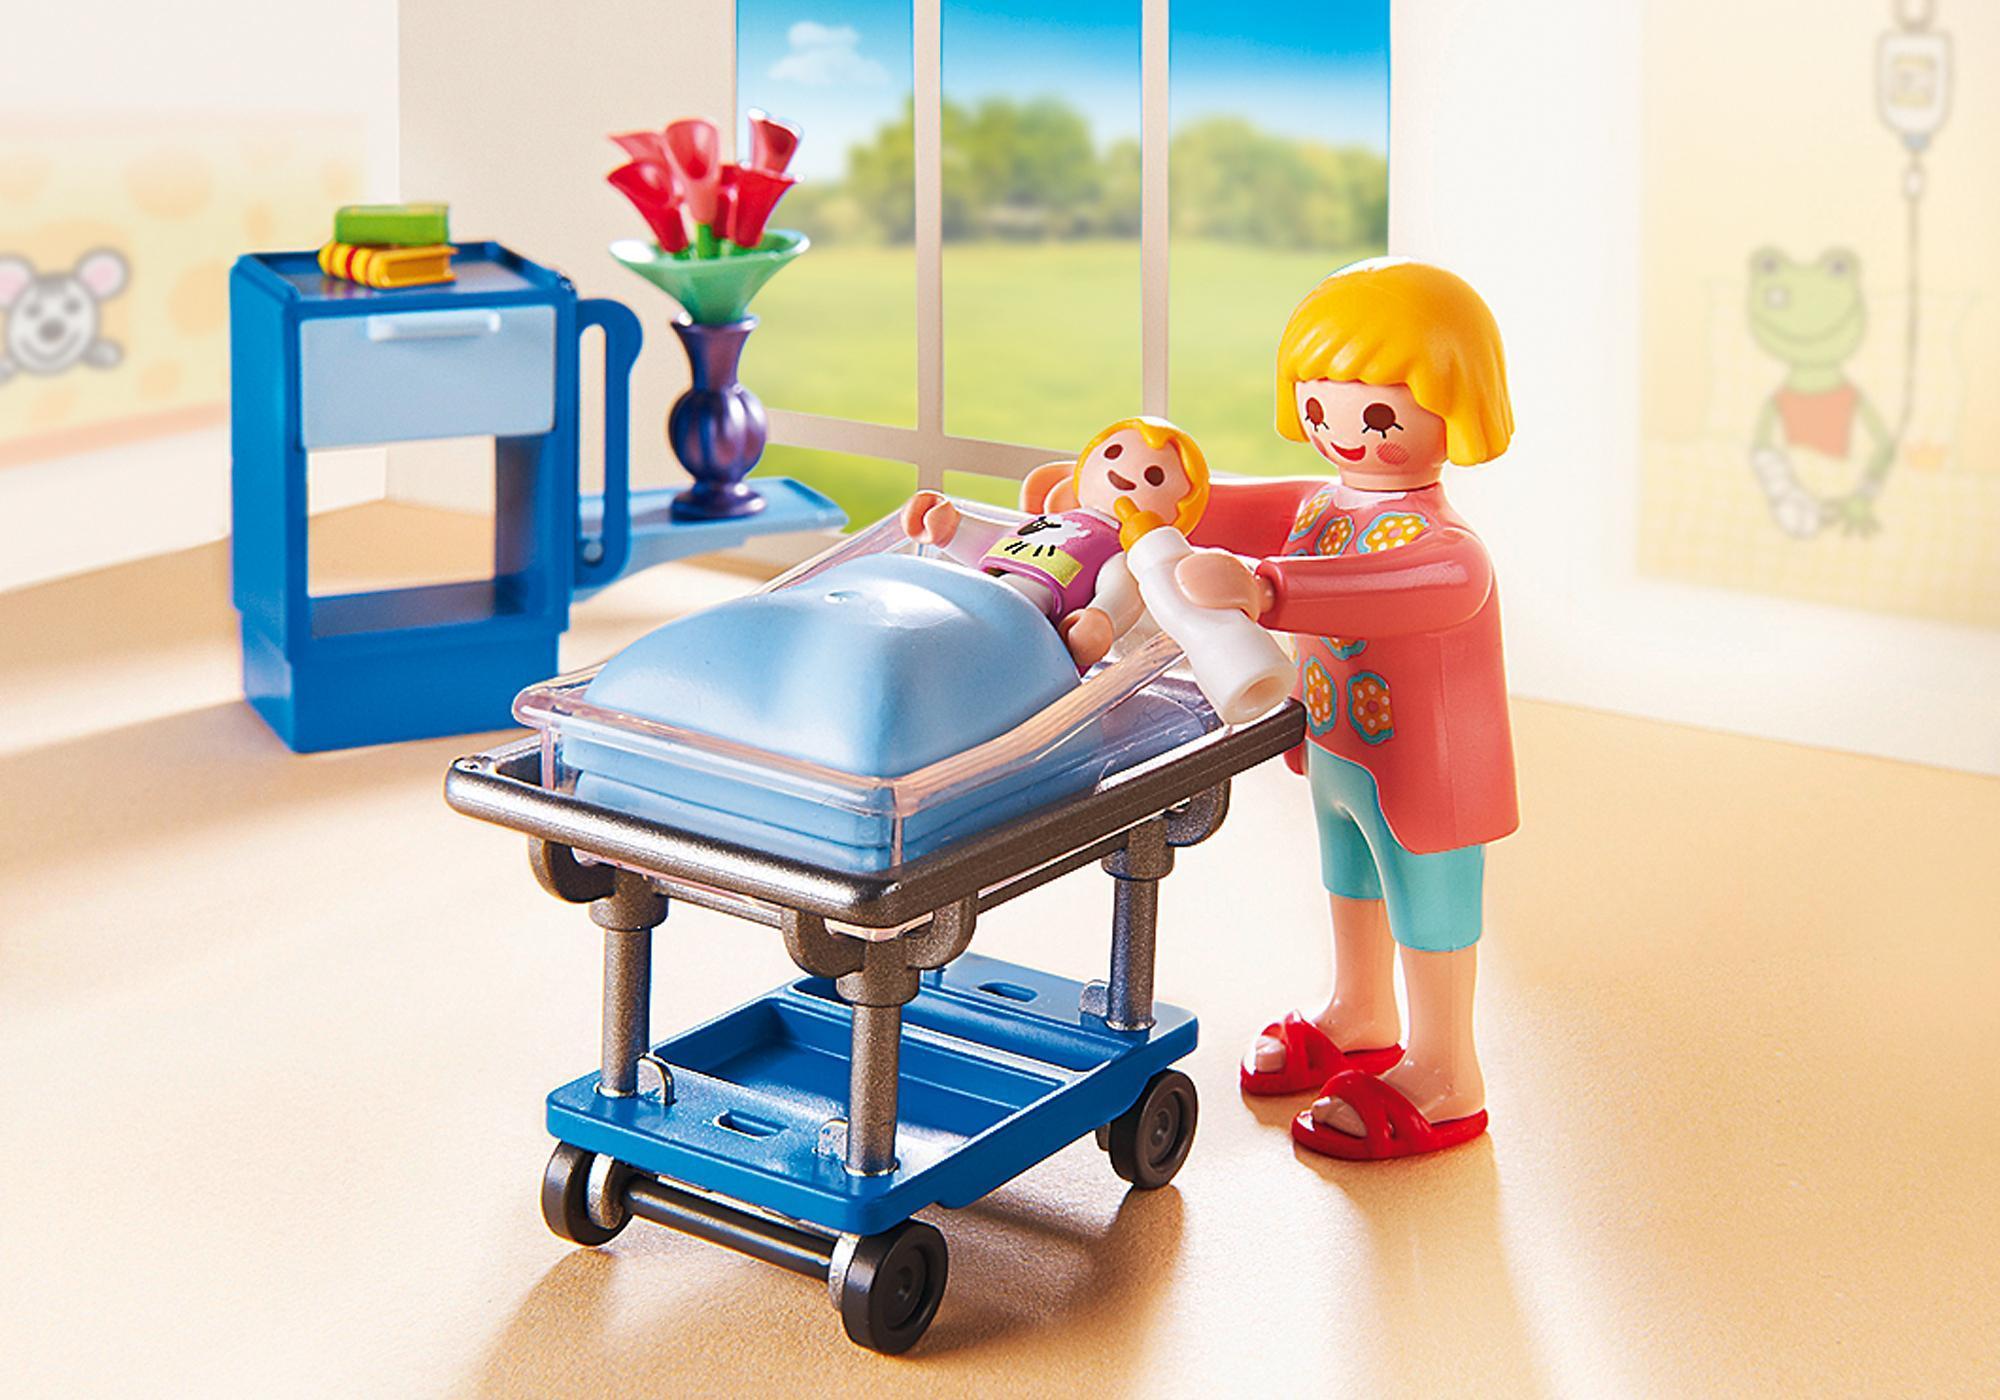 http://media.playmobil.com/i/playmobil/6660_product_extra1